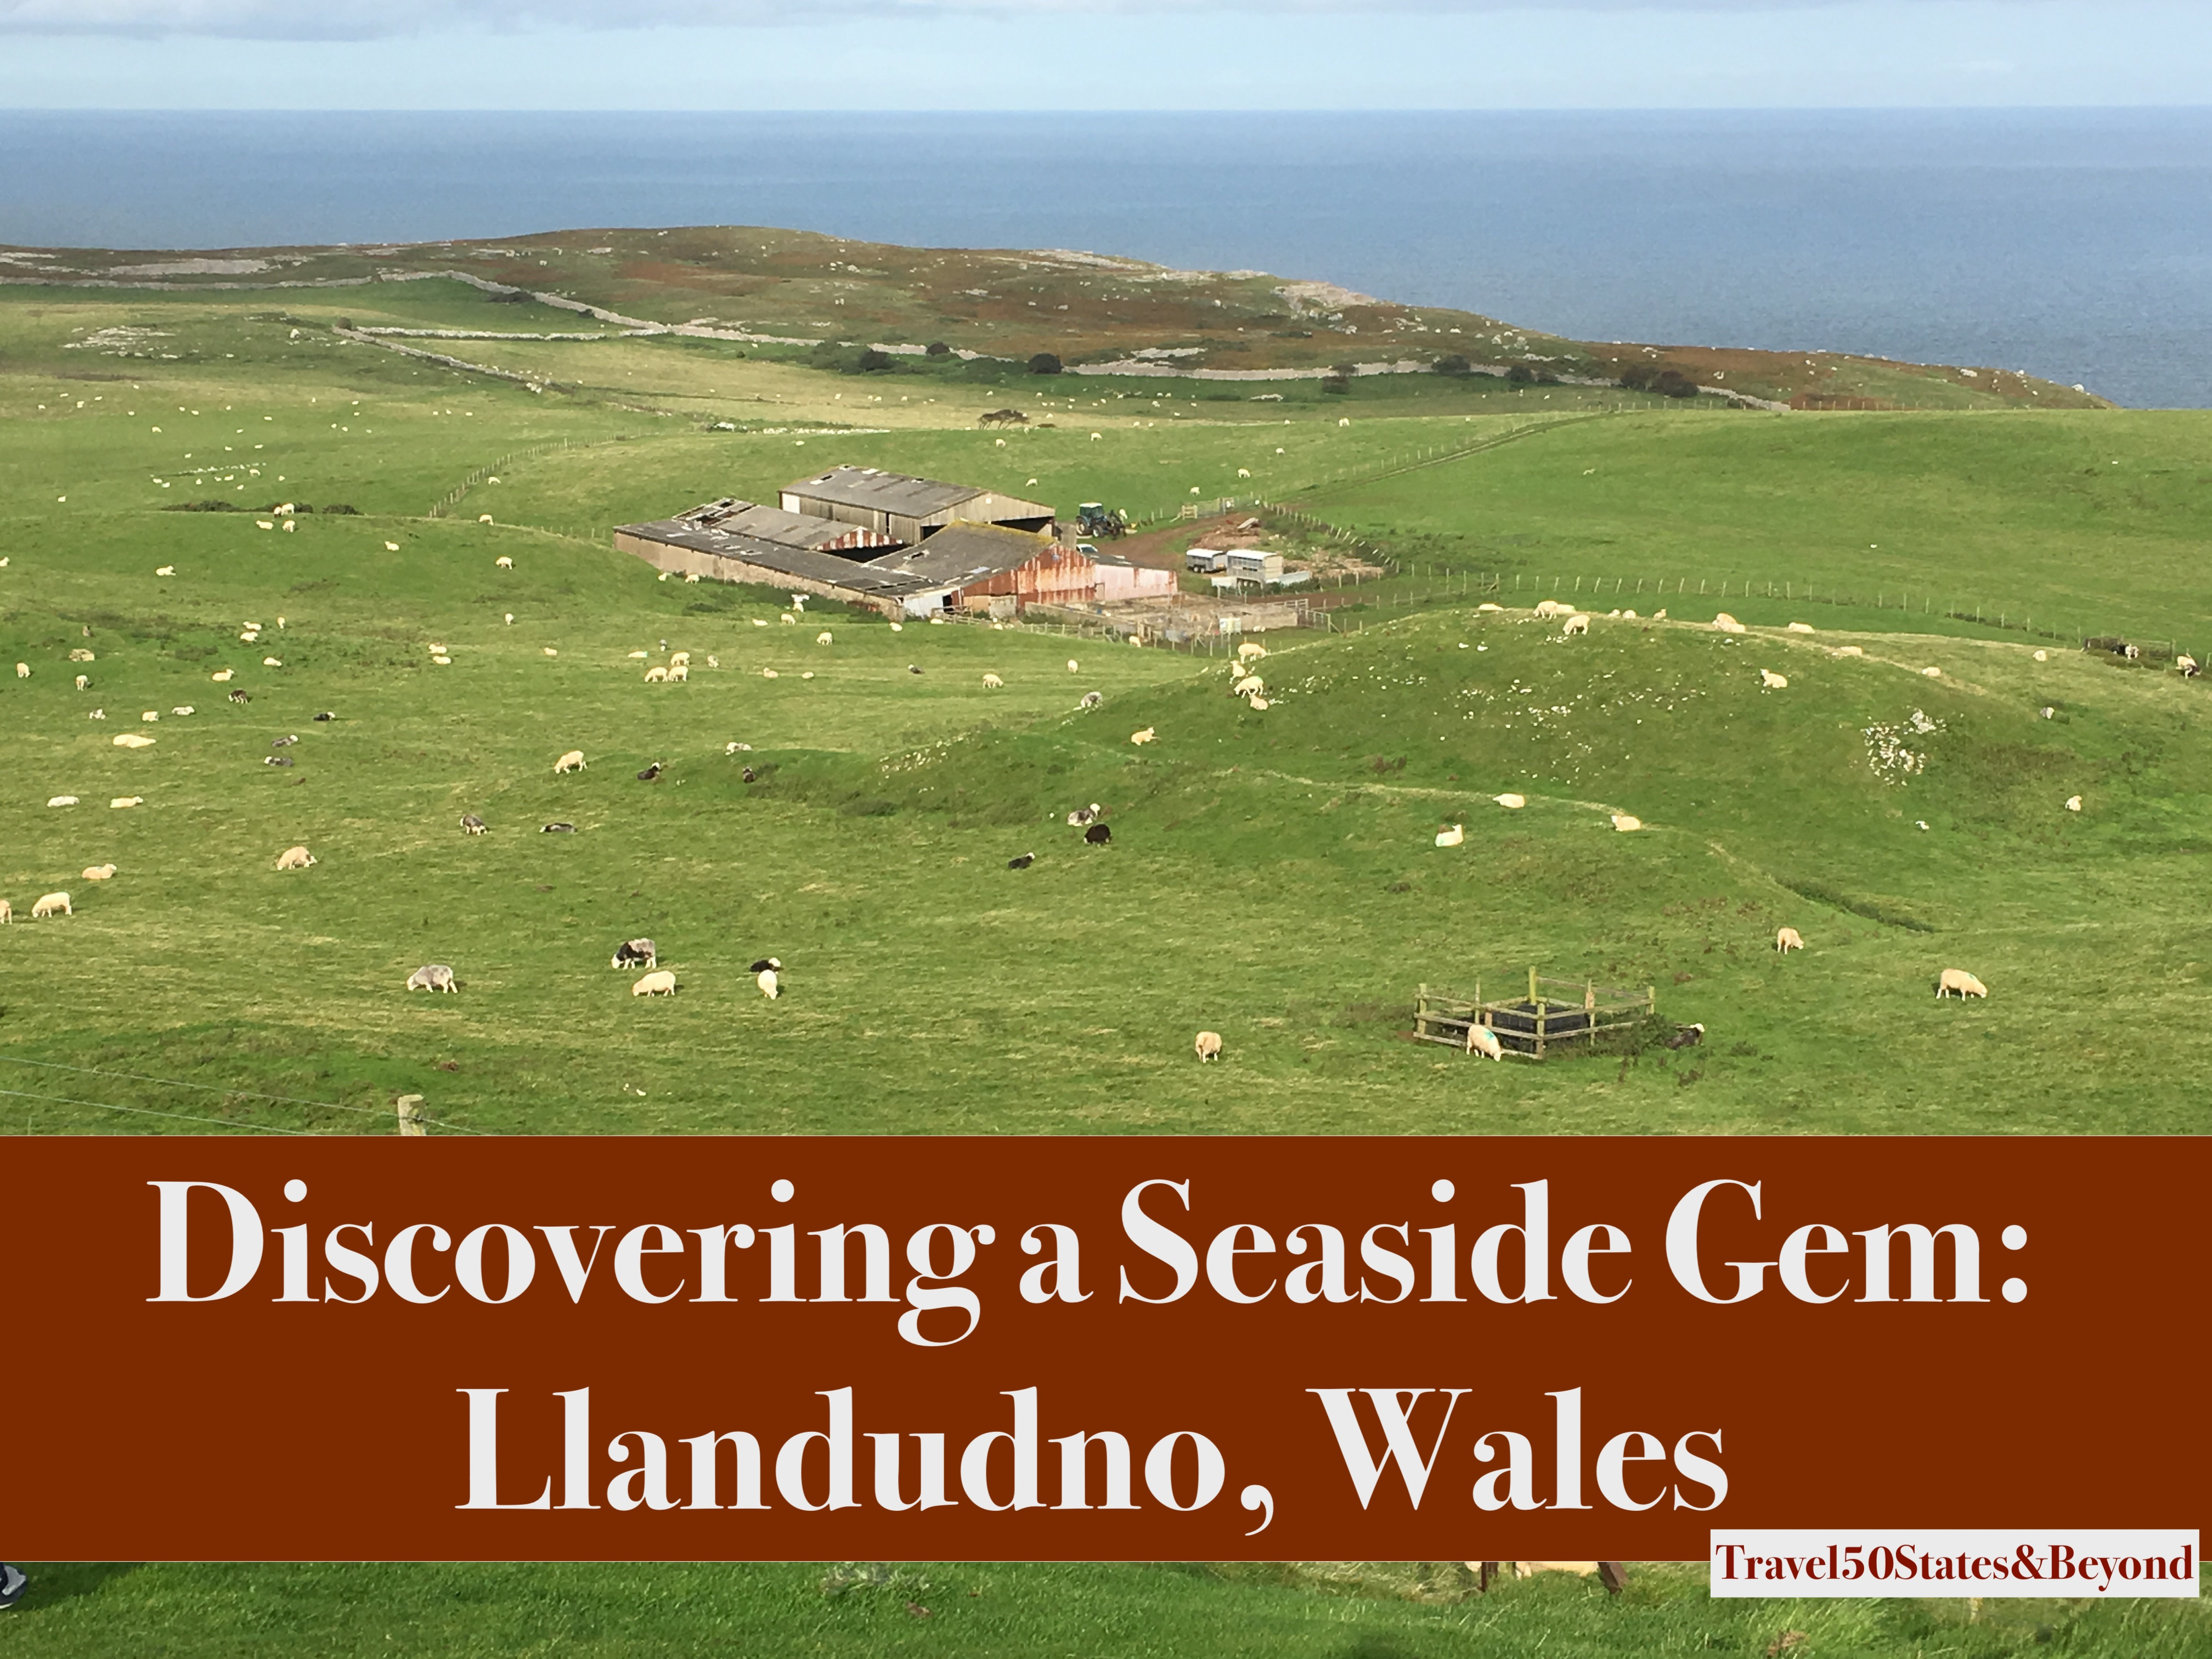 Discovering a Seaside Gem in Llandundo, Wales